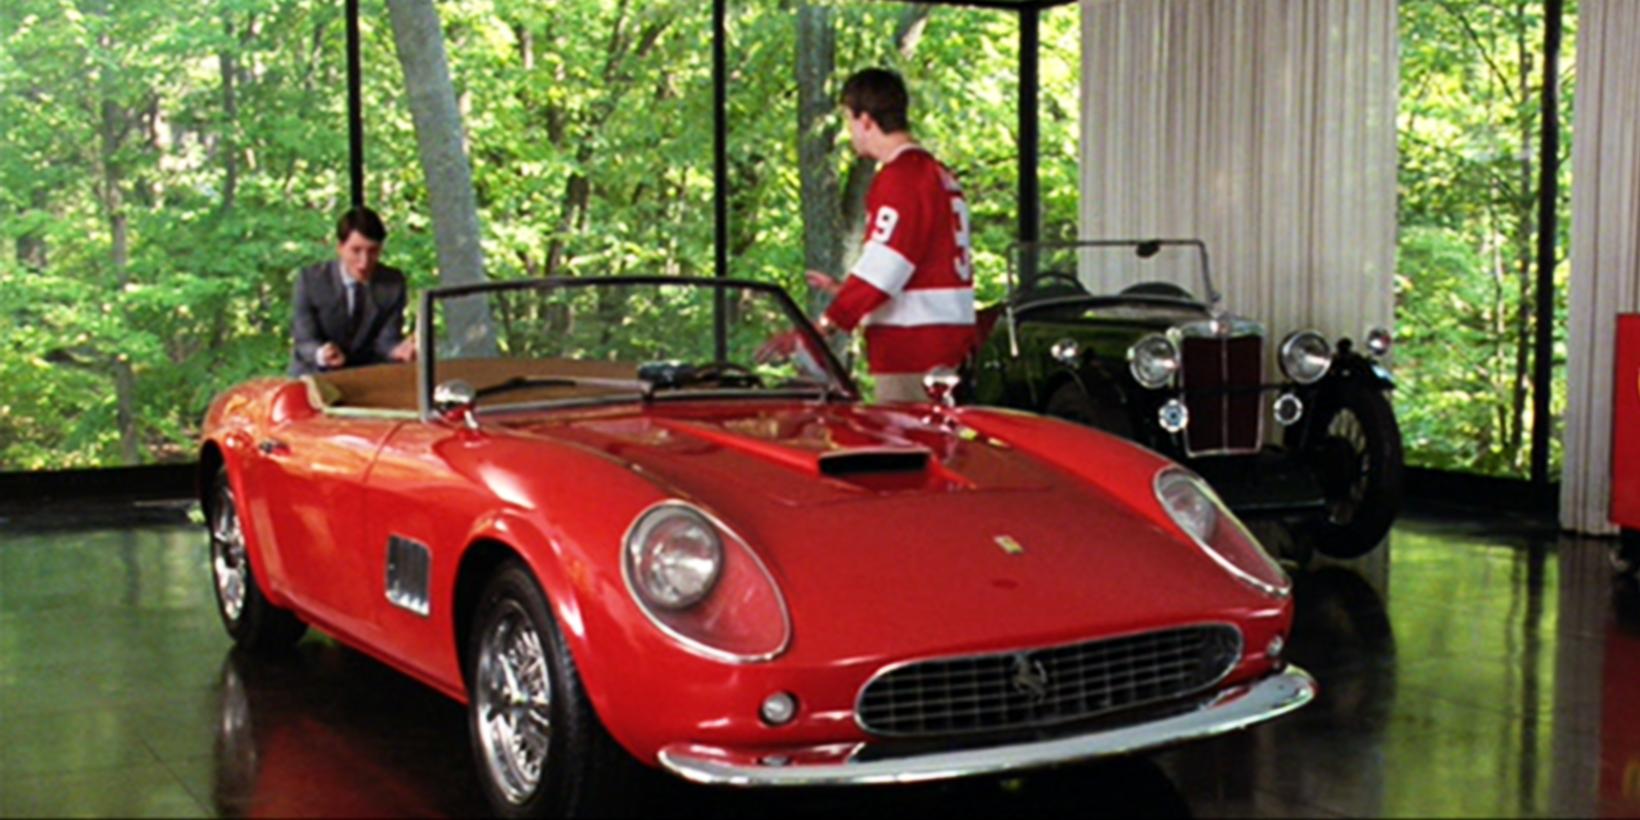 ferris bueller car - Google Search | Ferris bueller, Cars movie, Ferris  bueller's day off